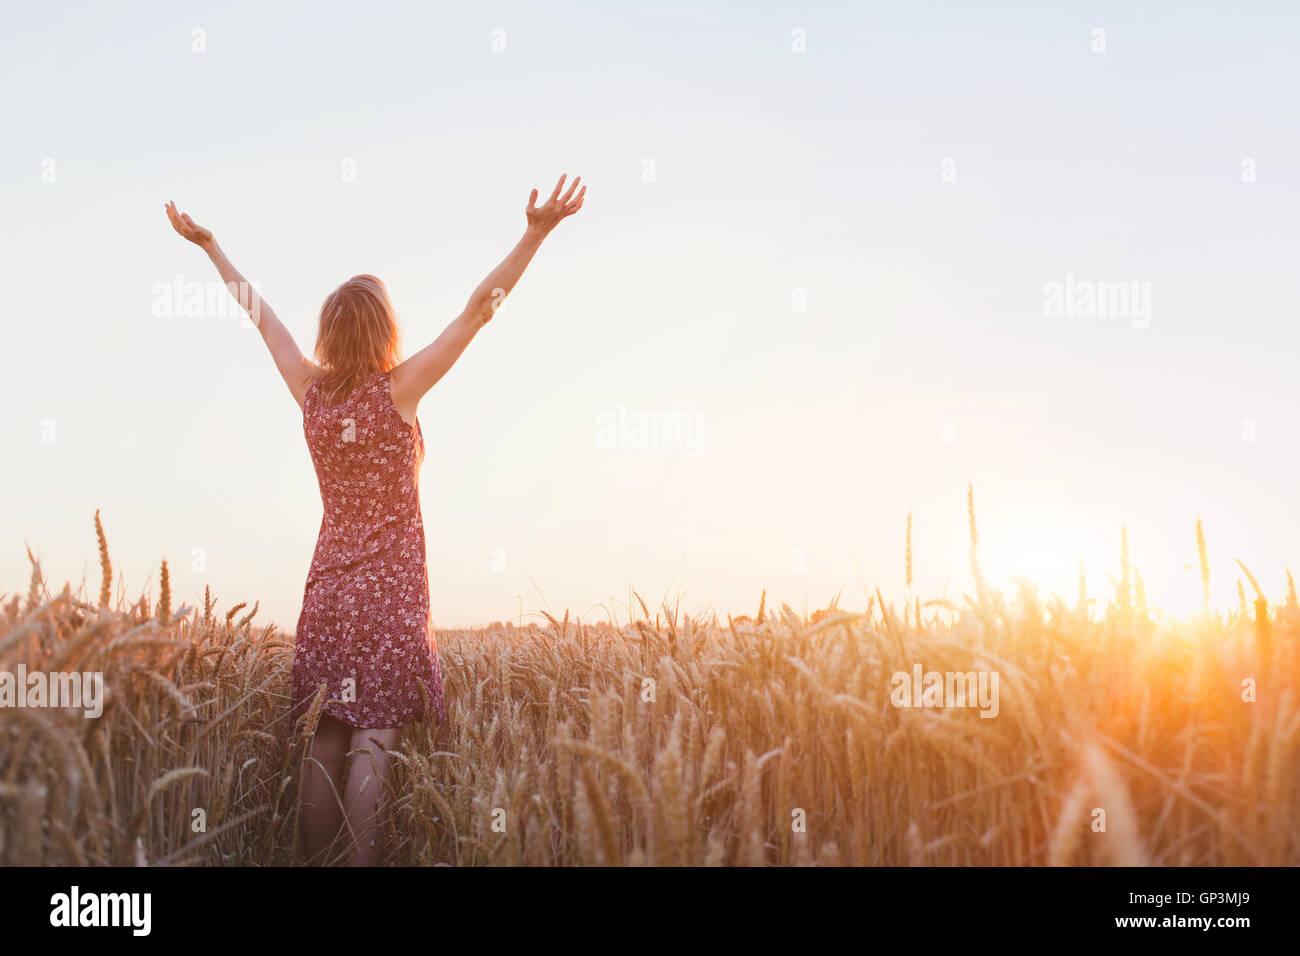 Atmung, Frau mit erhobenen Händen Sonnenuntergang im Feld Stockbild